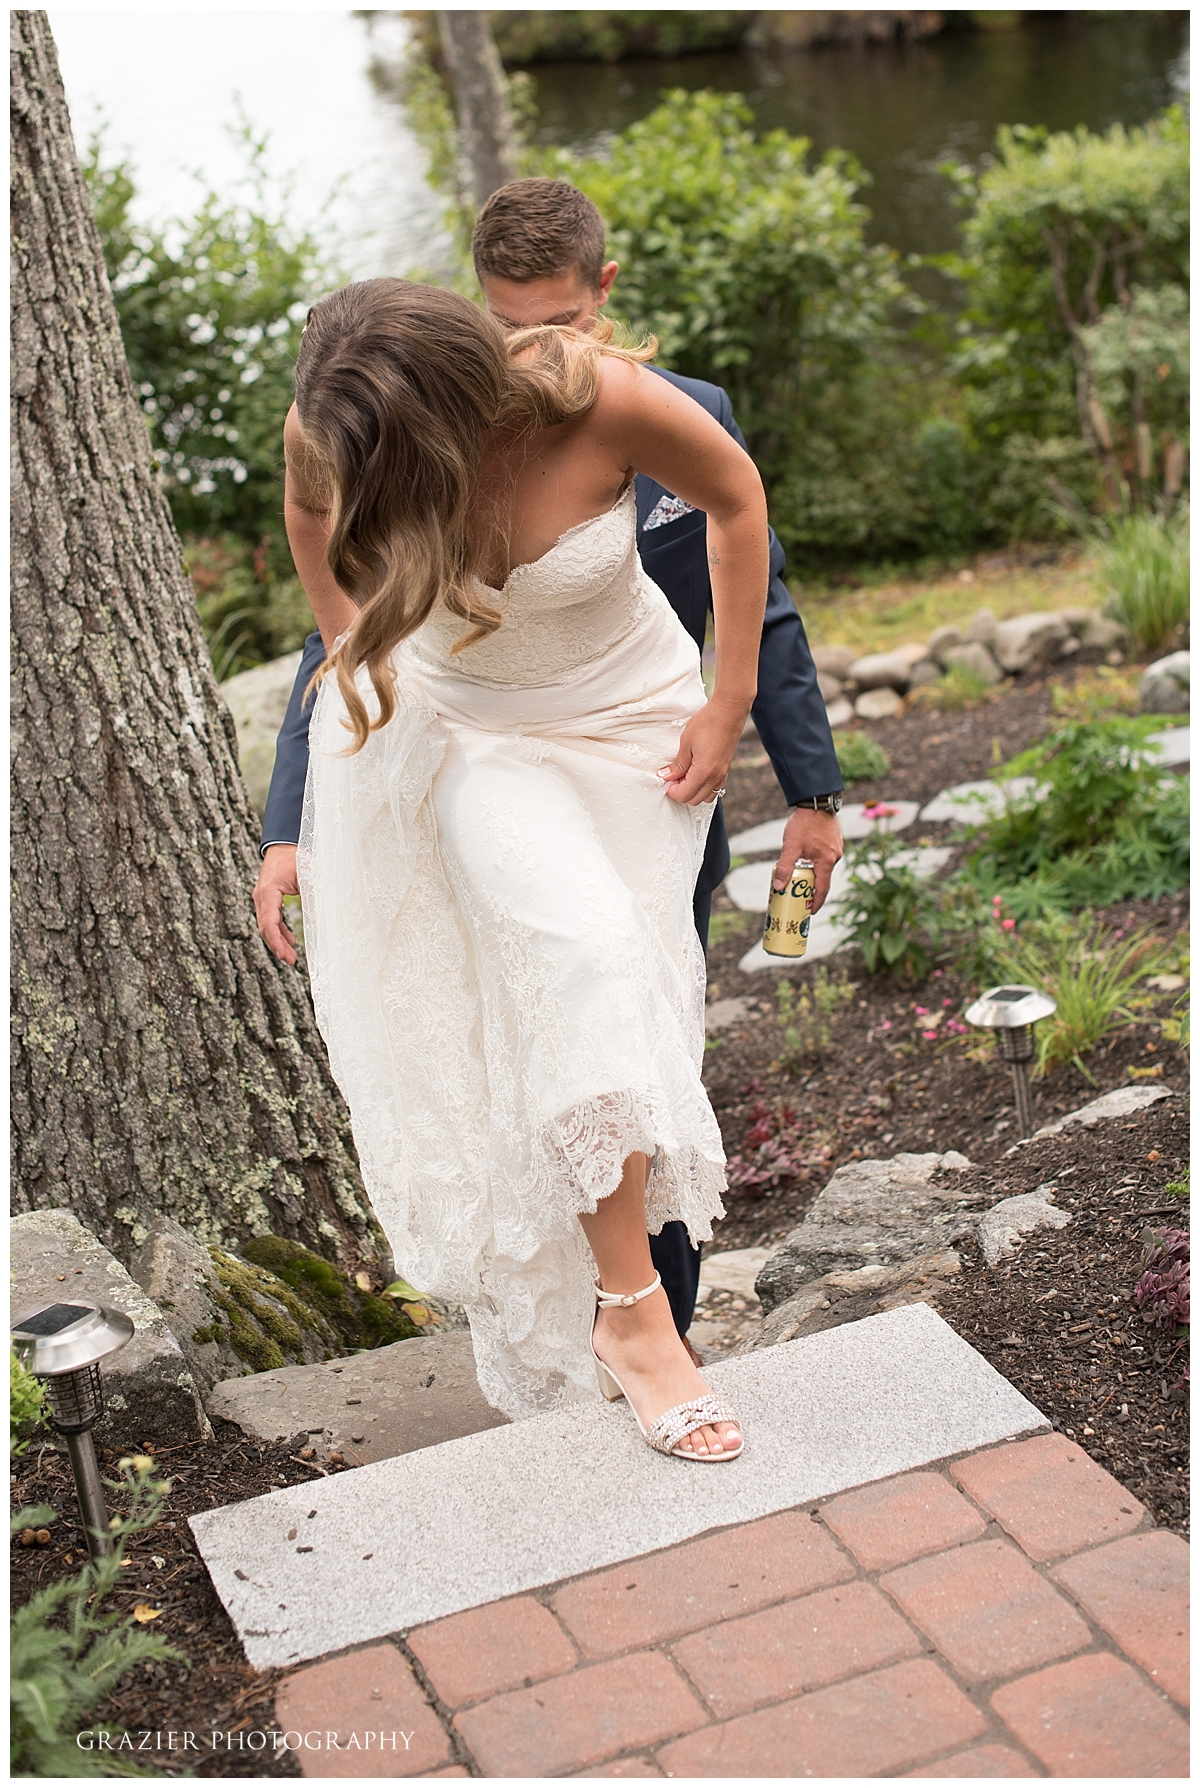 New Hampshire Lake Wedding Grazier Photography 170909-146_WEB.jpg